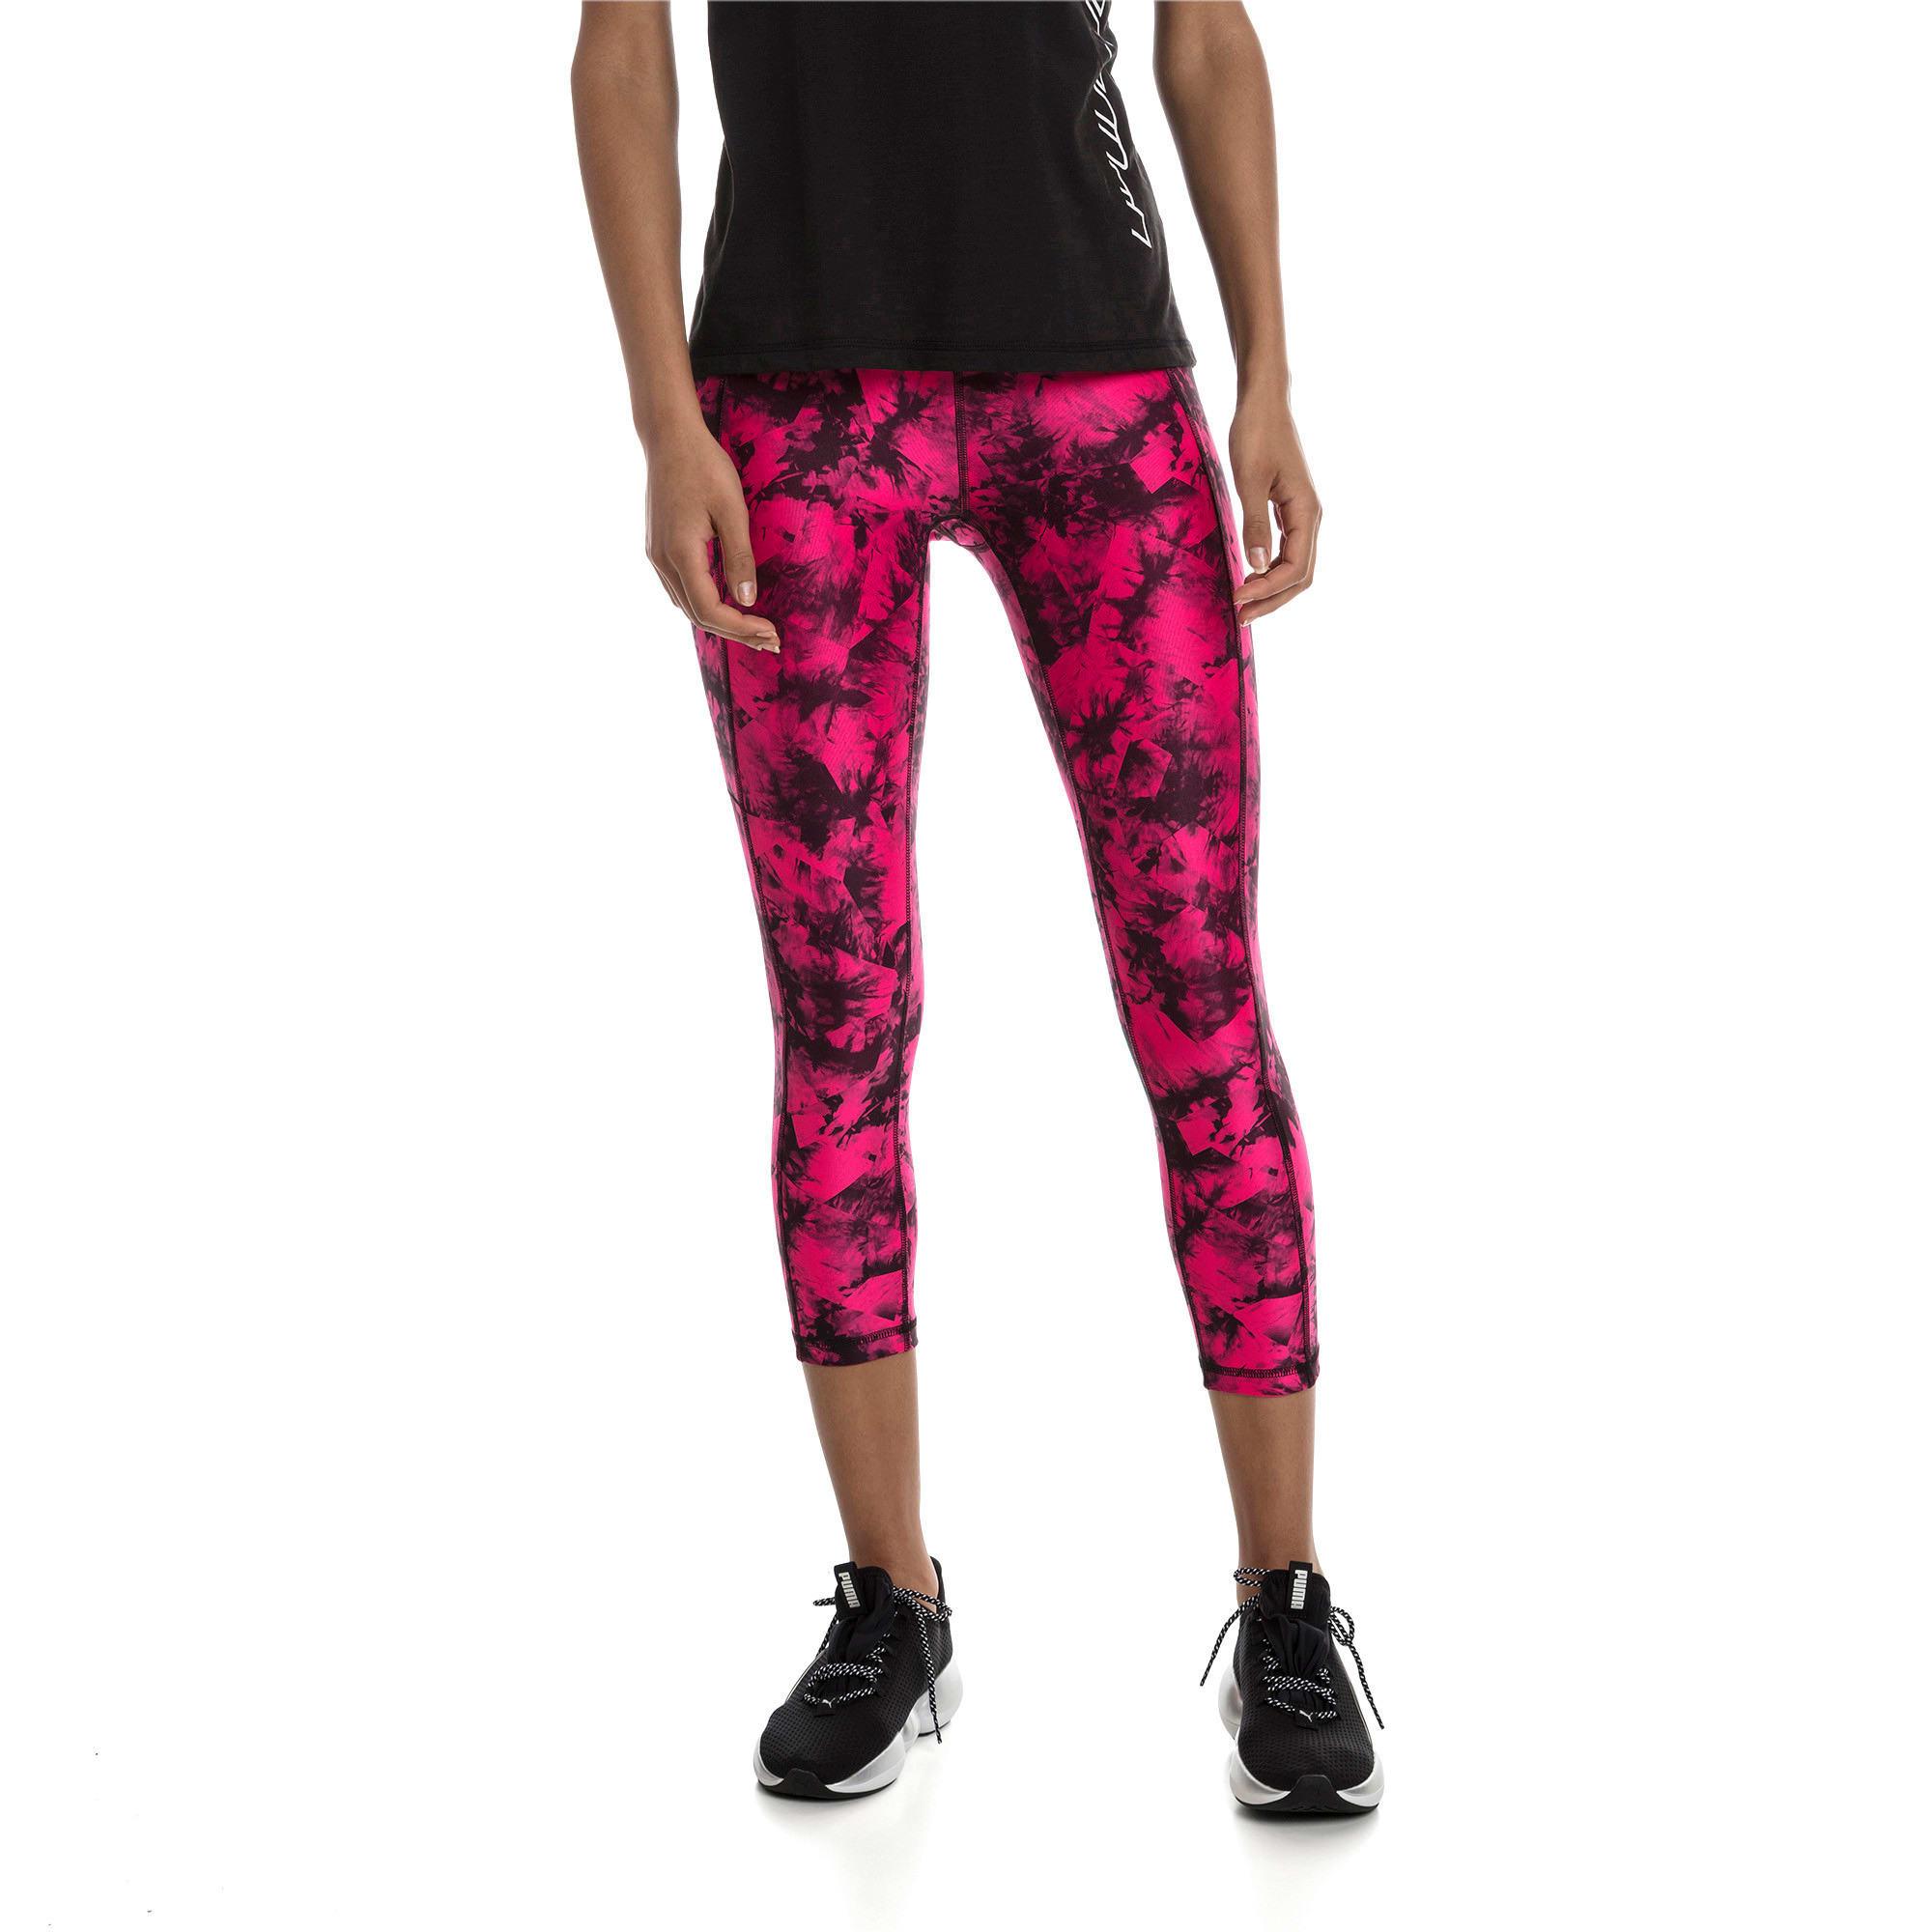 Thumbnail 1 of Stand Out Women's Training Leggings, fuchsia purple-puma black, medium